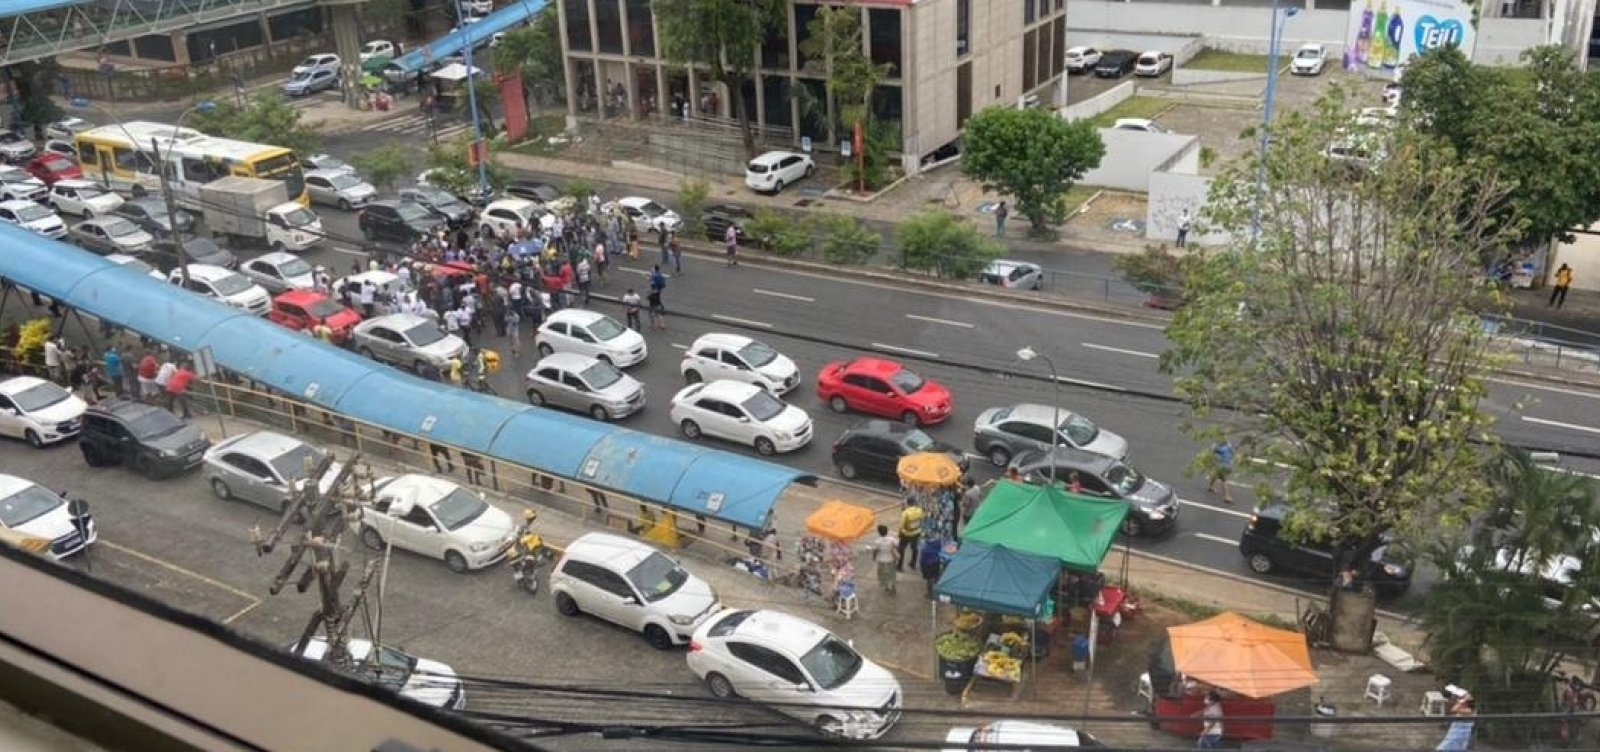 Protesto de motoristas de app trava Avenida Tancredo Neves após manifestante ser detido pela PM